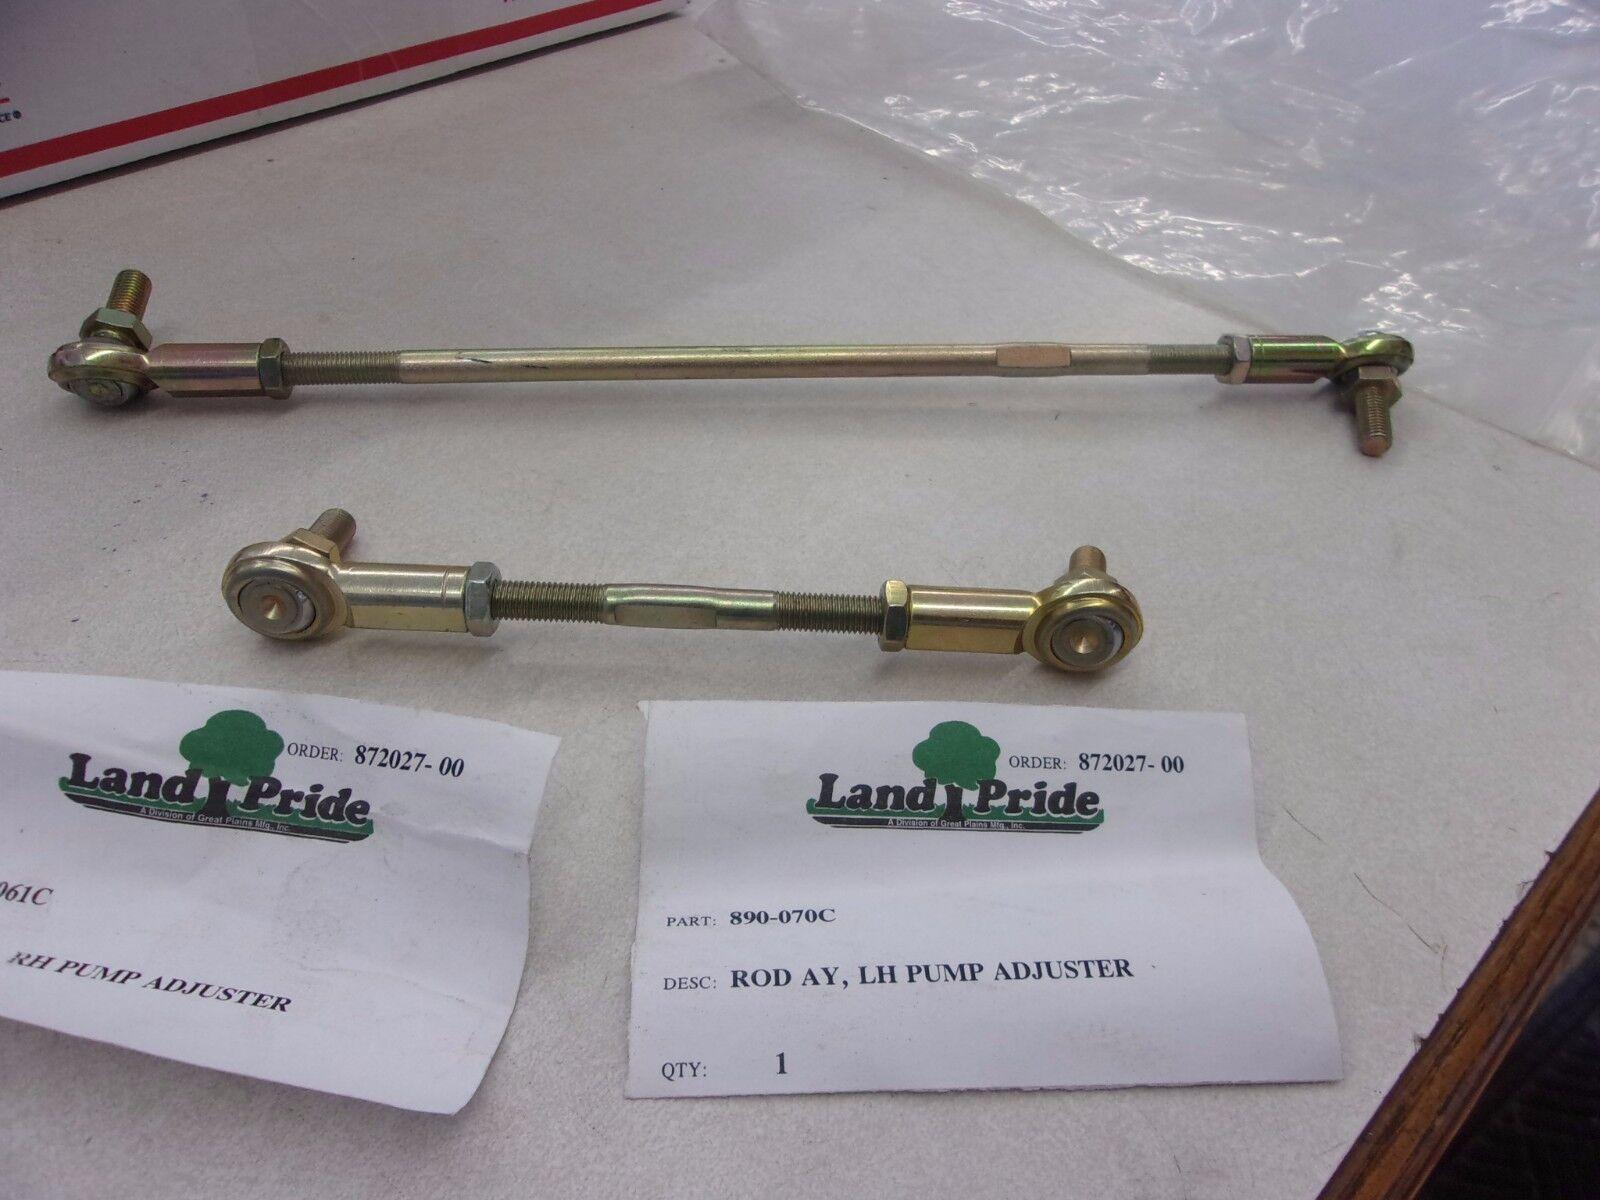 Original Equipment Manufacturer Land Pride 890-061 C Varilla Ay RH bomba Ajustador 890-070 C Varilla Ay, LH BOMBA adjuste